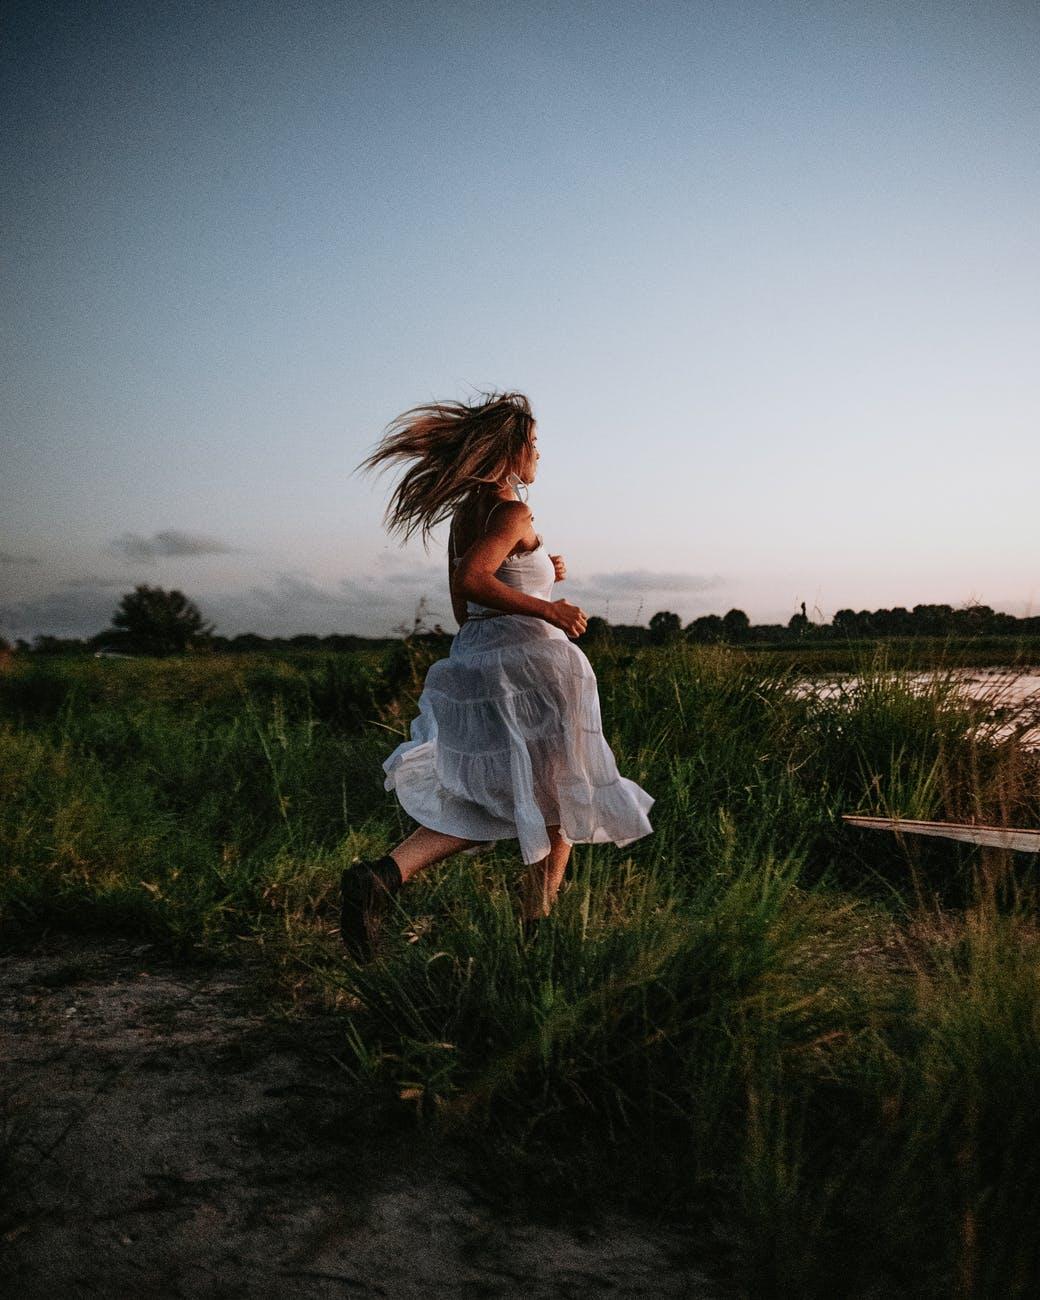 woman in summer dress running through grass to pond